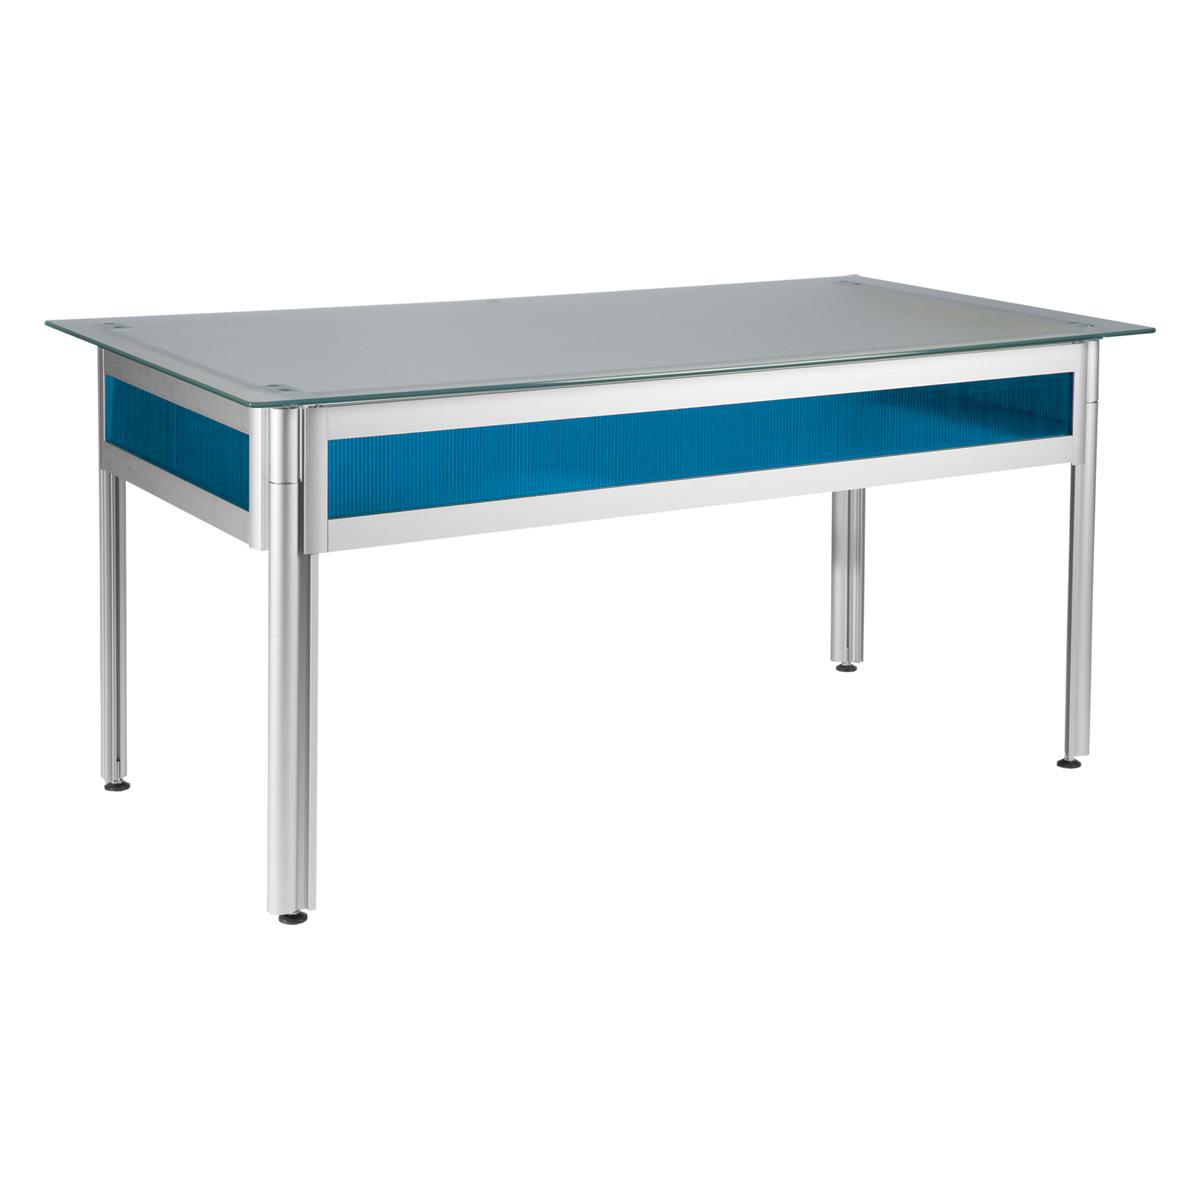 bureau flashy bleu plateau verre opaque 120x80 internation moduling. Black Bedroom Furniture Sets. Home Design Ideas